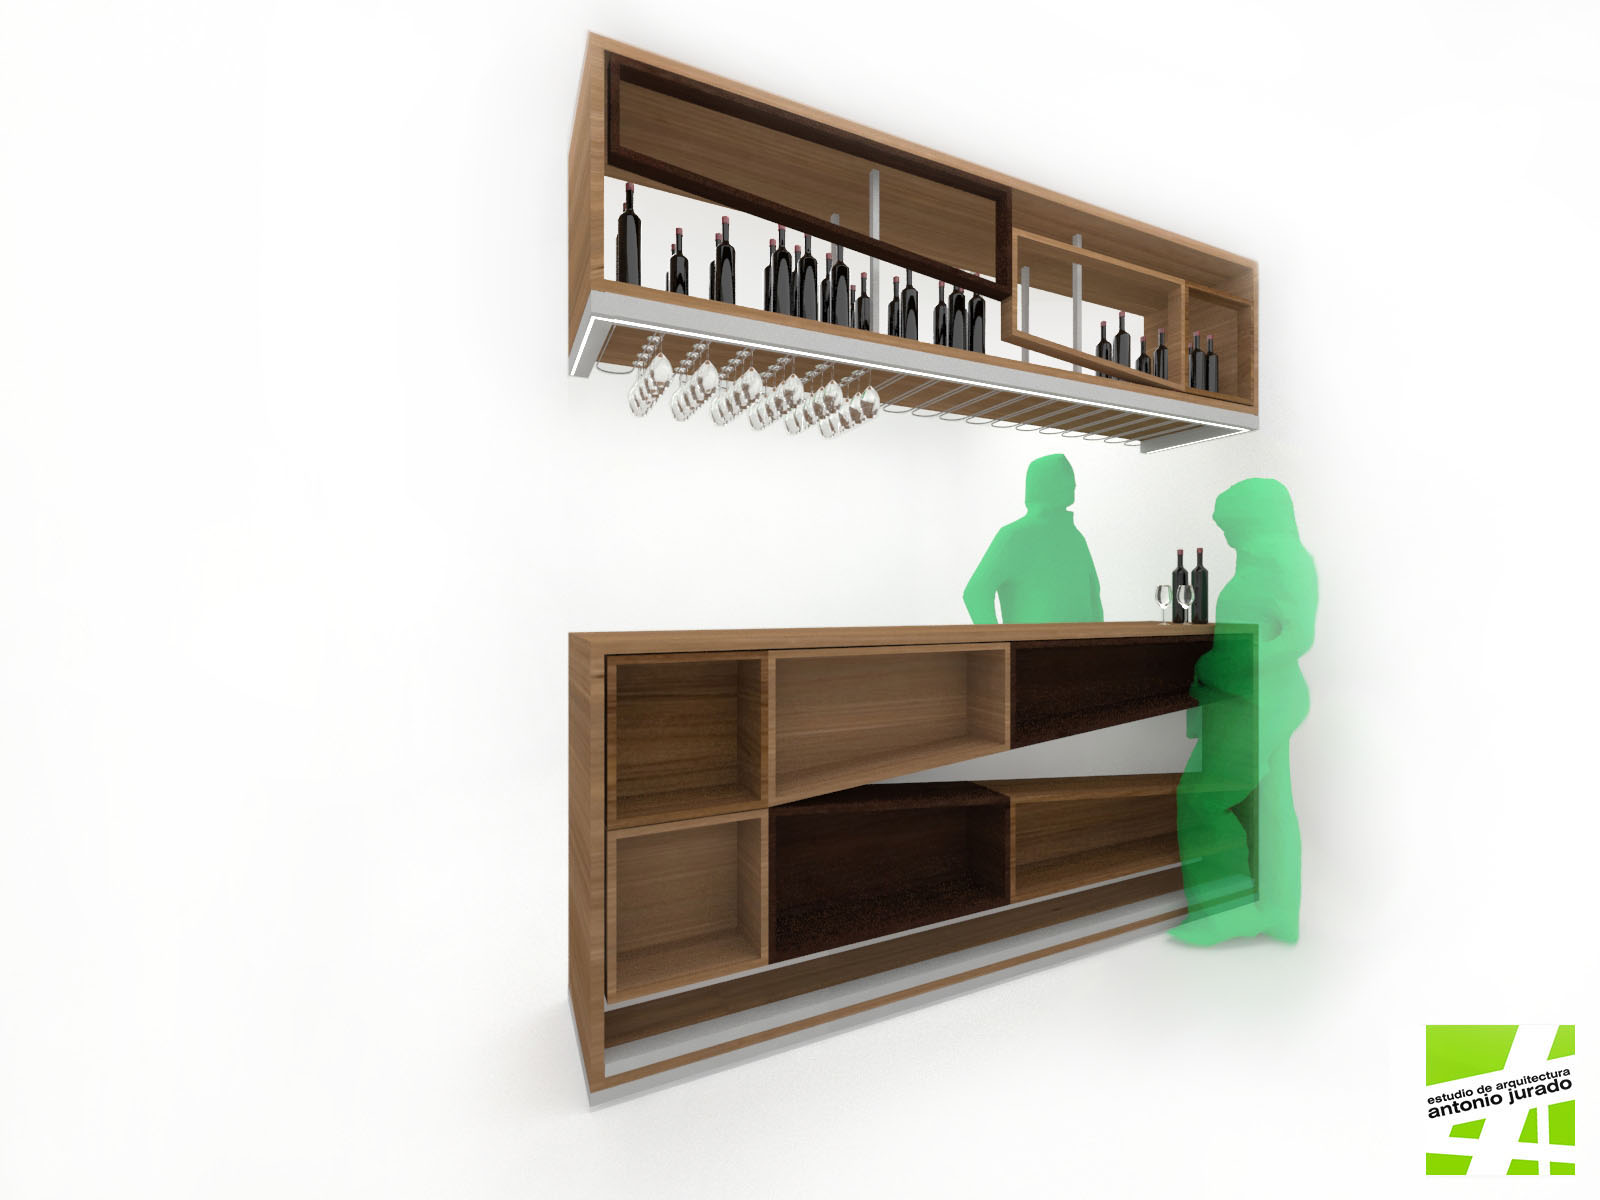 diseño de mobiliario barra bar bodega estudio de arquitectura interiorismo arquitectos antonio jurado malaga